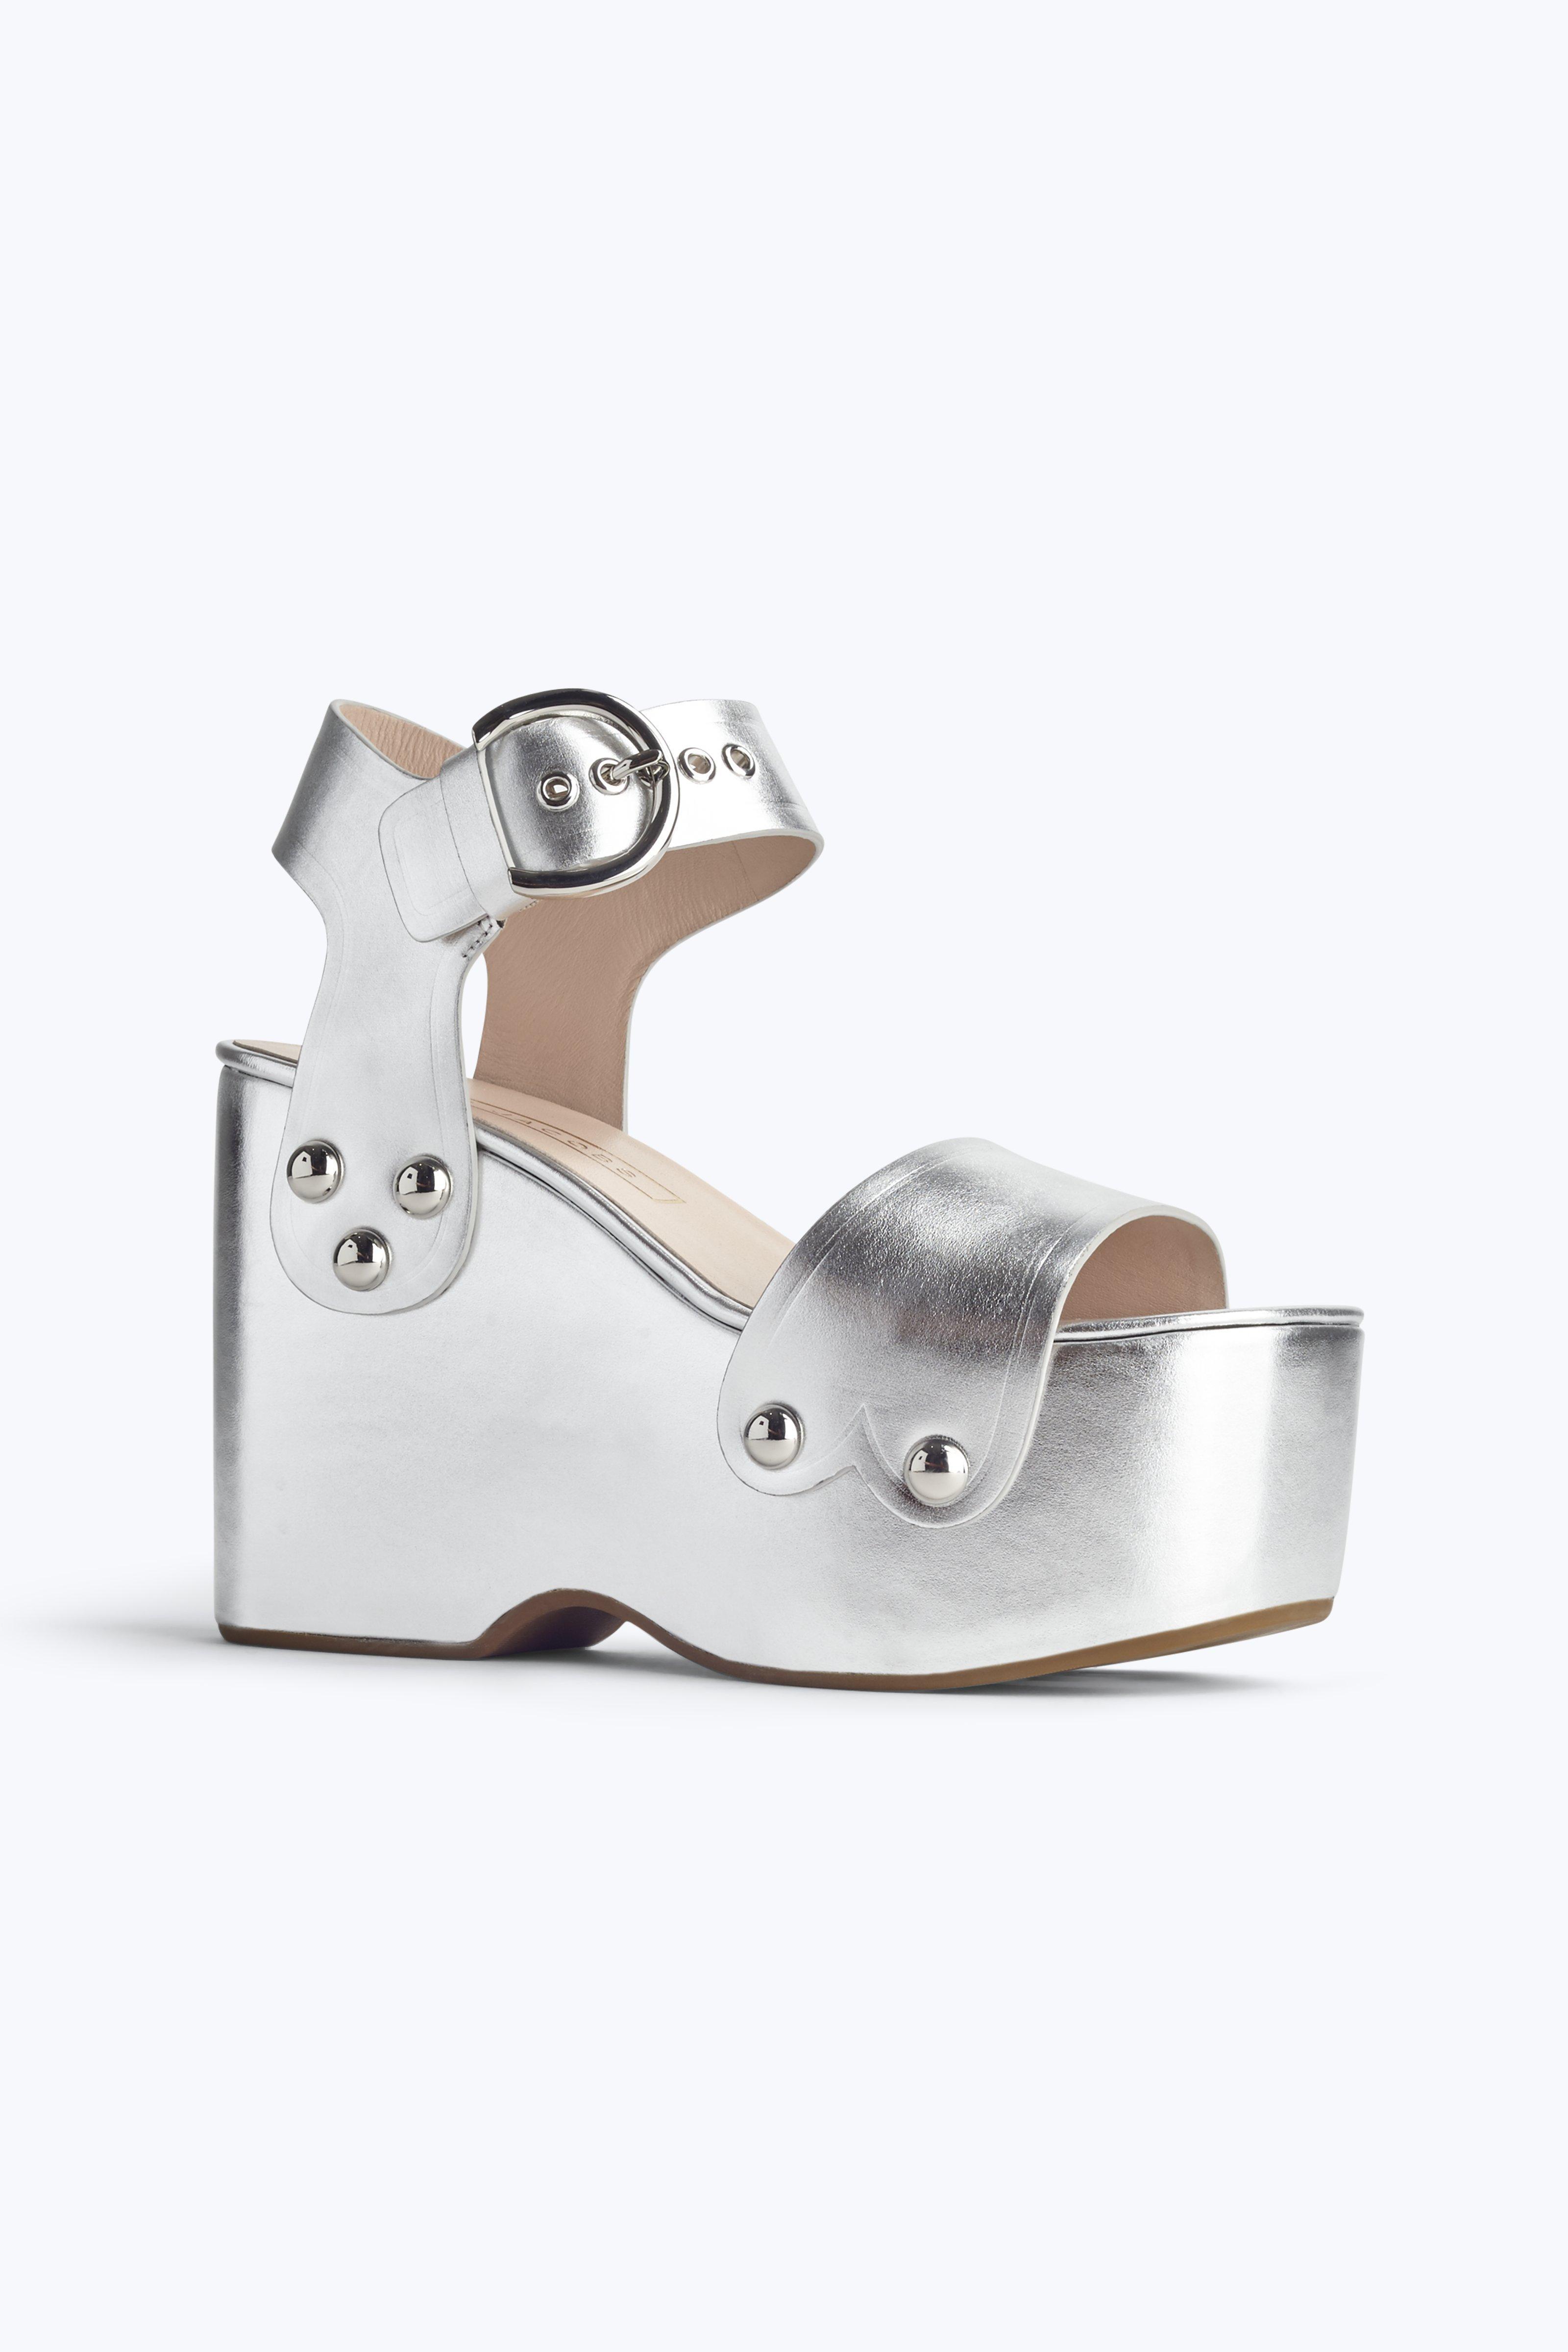 Marc Jacobs Silver Lana Wedge Sandal